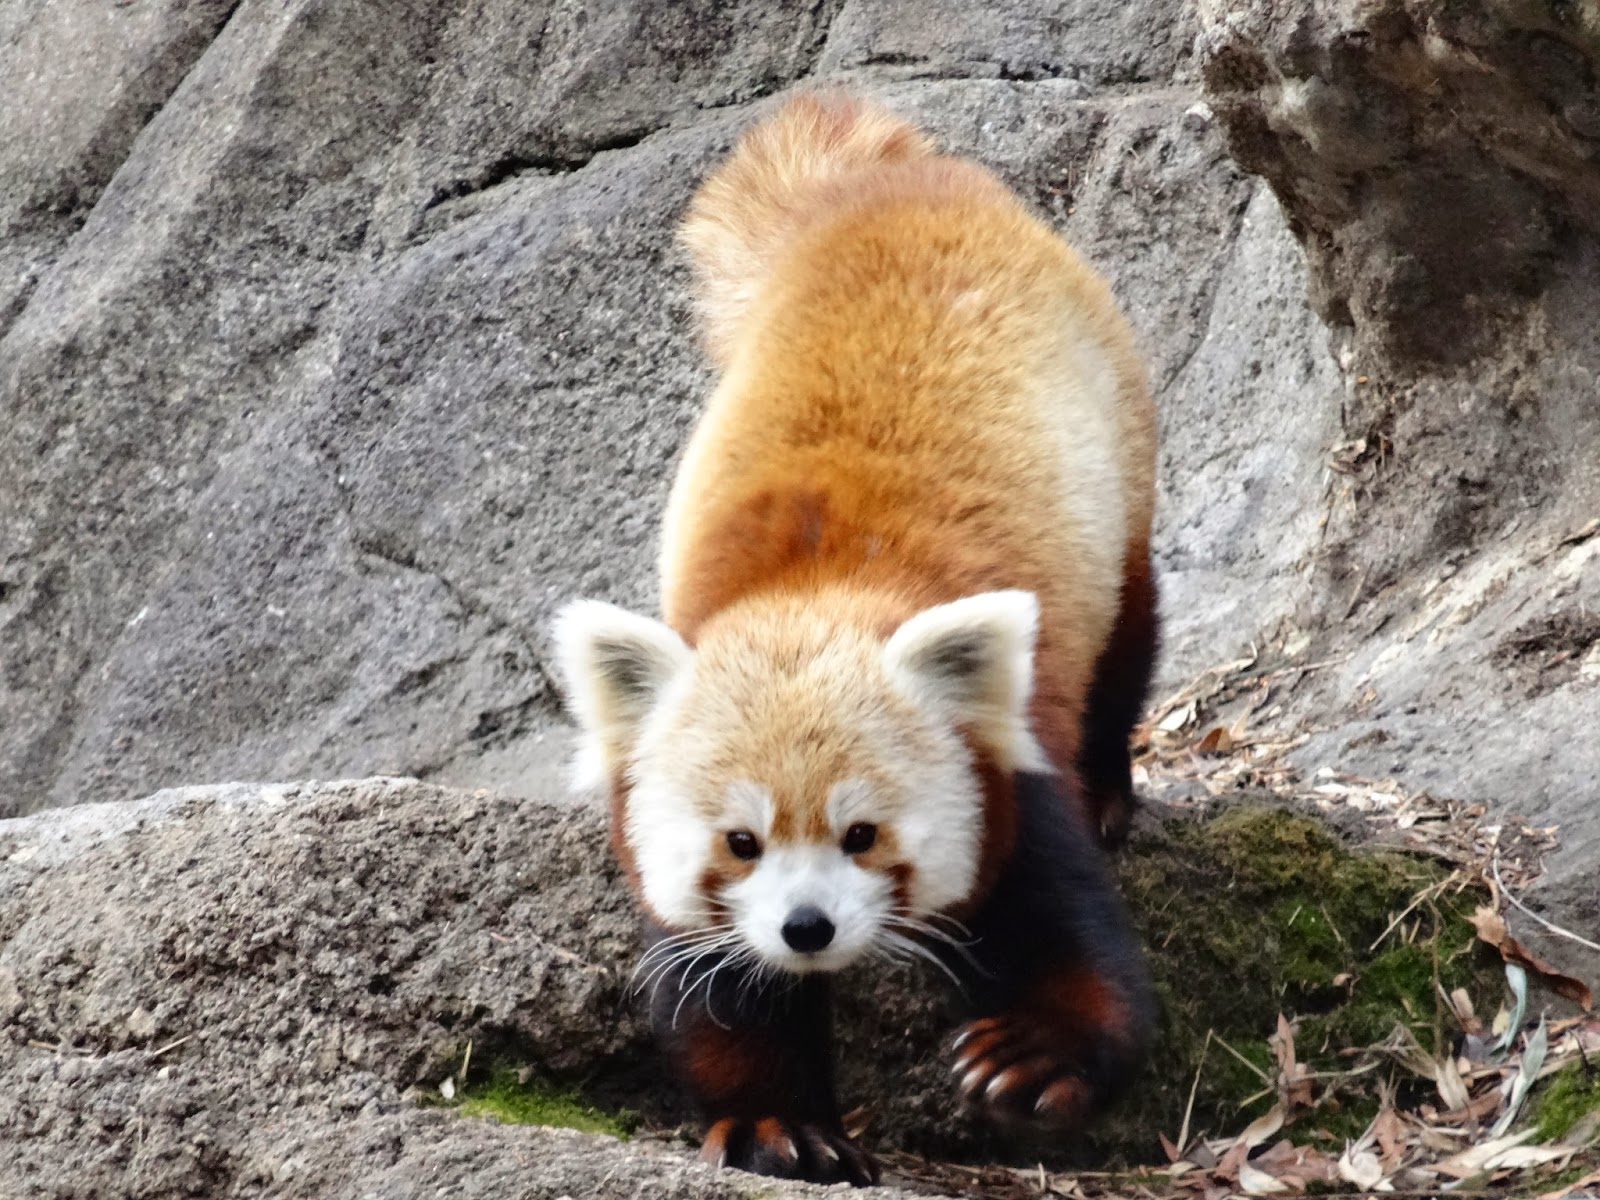 love joy and peas red pandas eating grooming and grooving